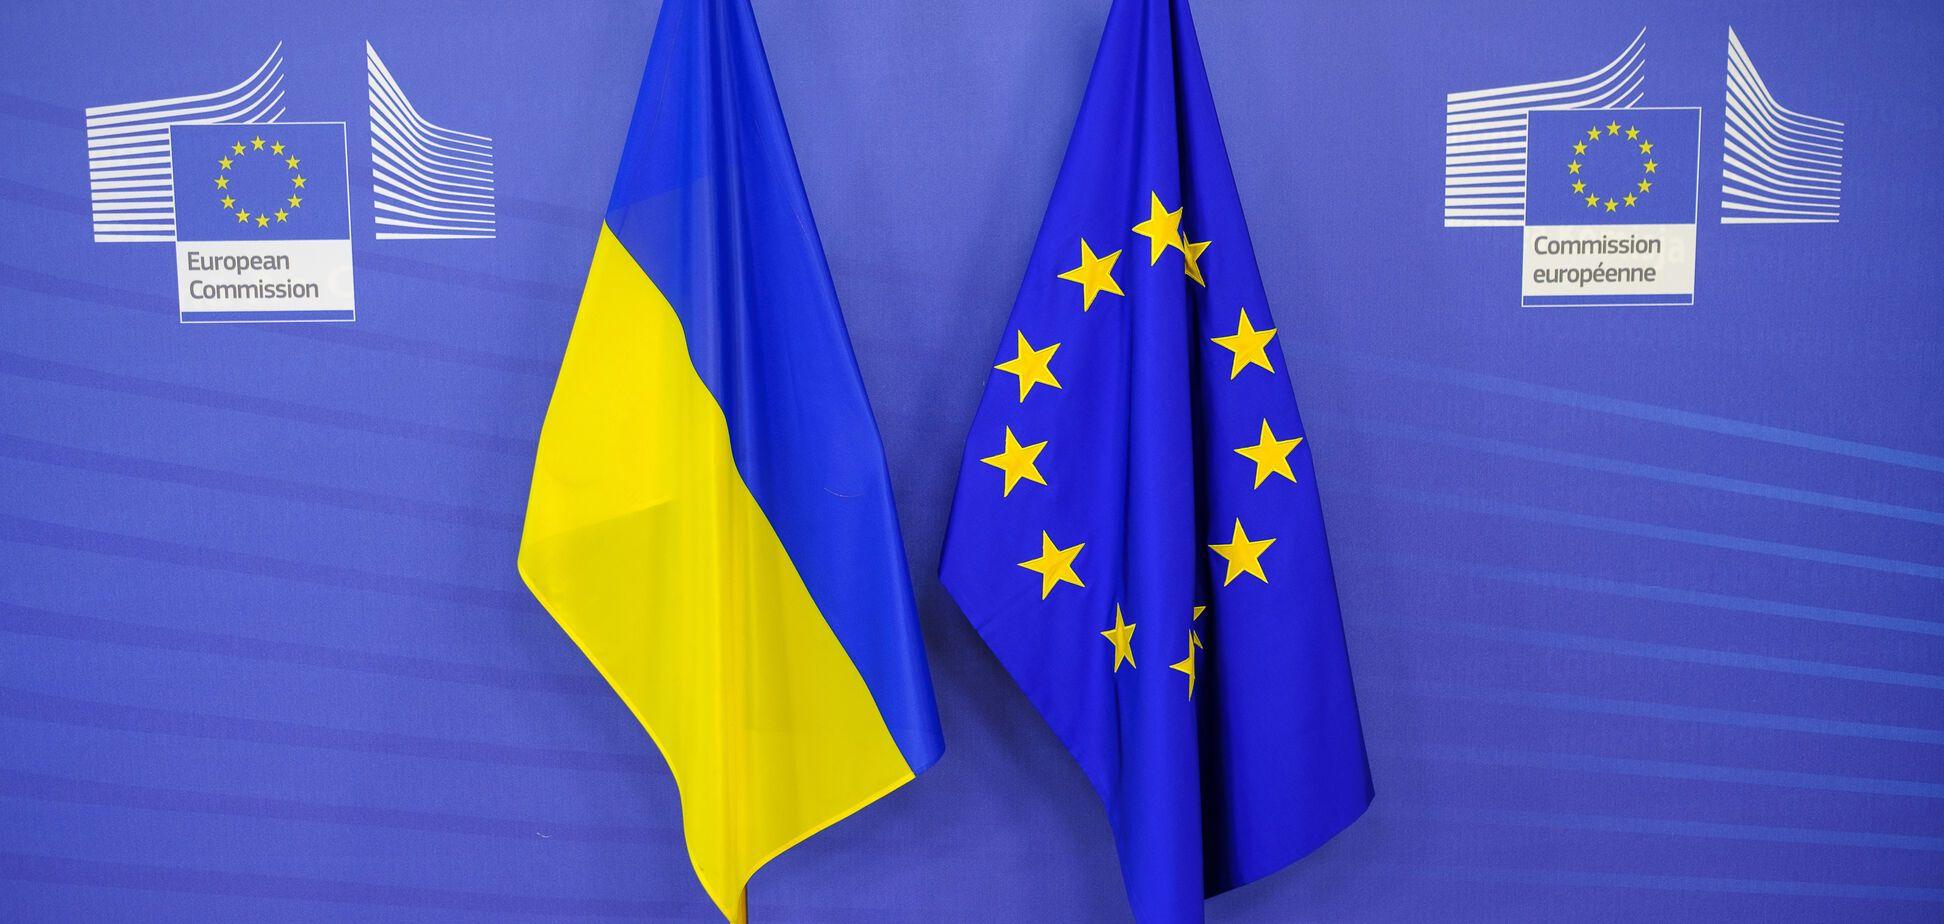 Україну можуть включити в список офшорних країн ЄС